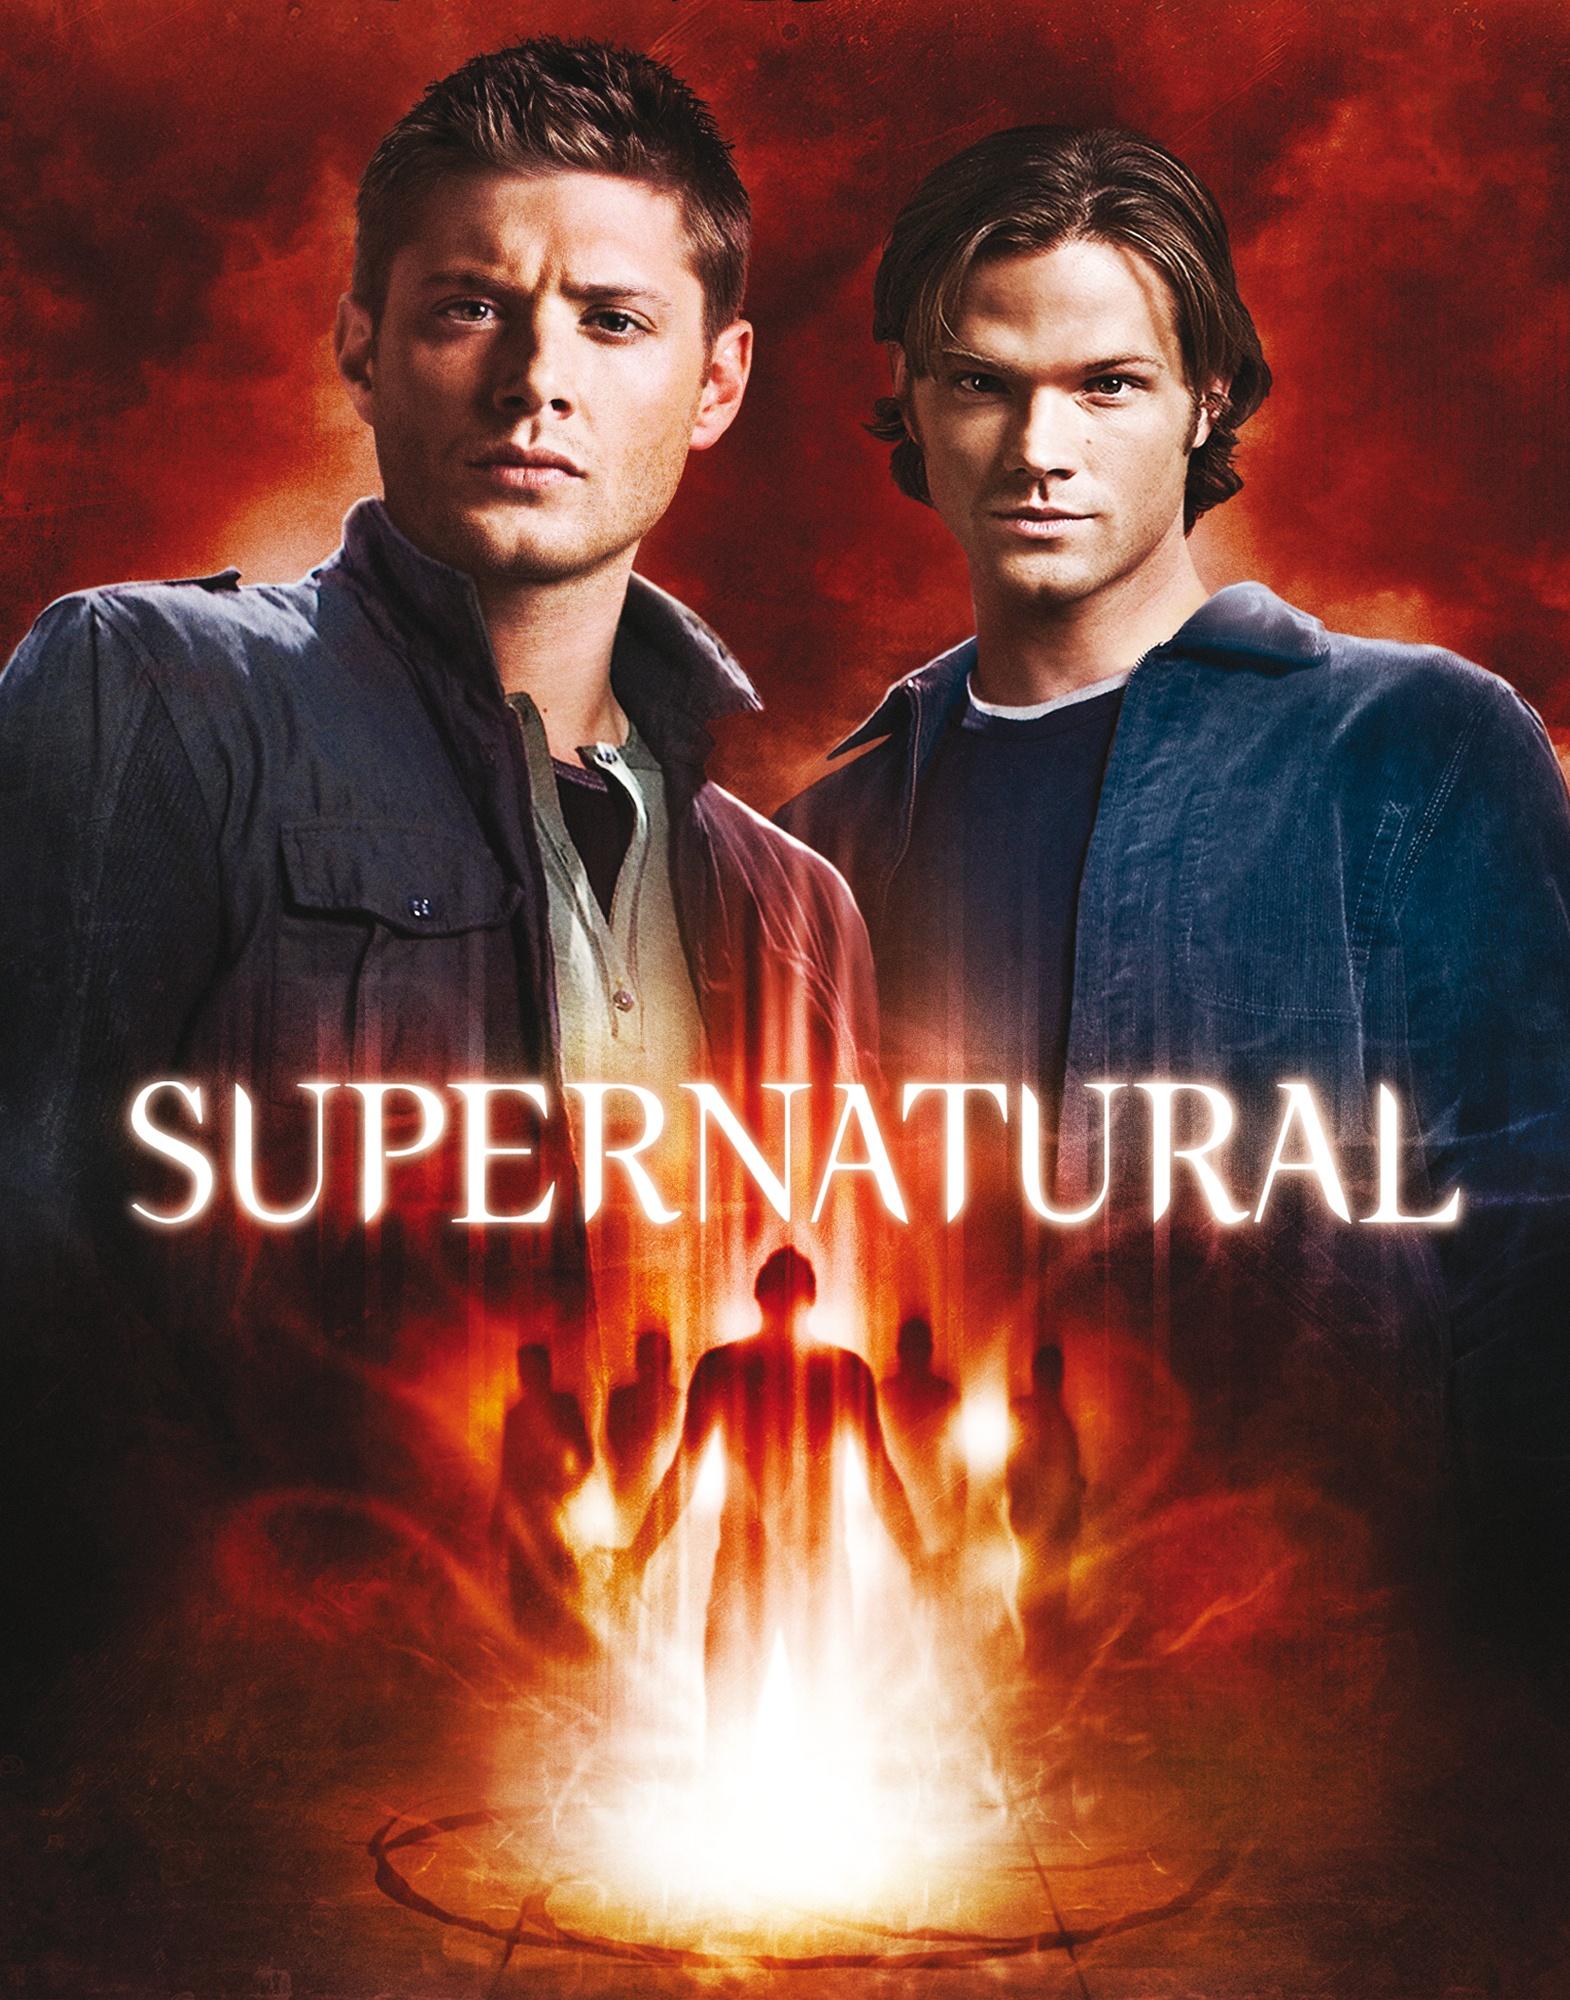 Supernatural_S5_Poster_01